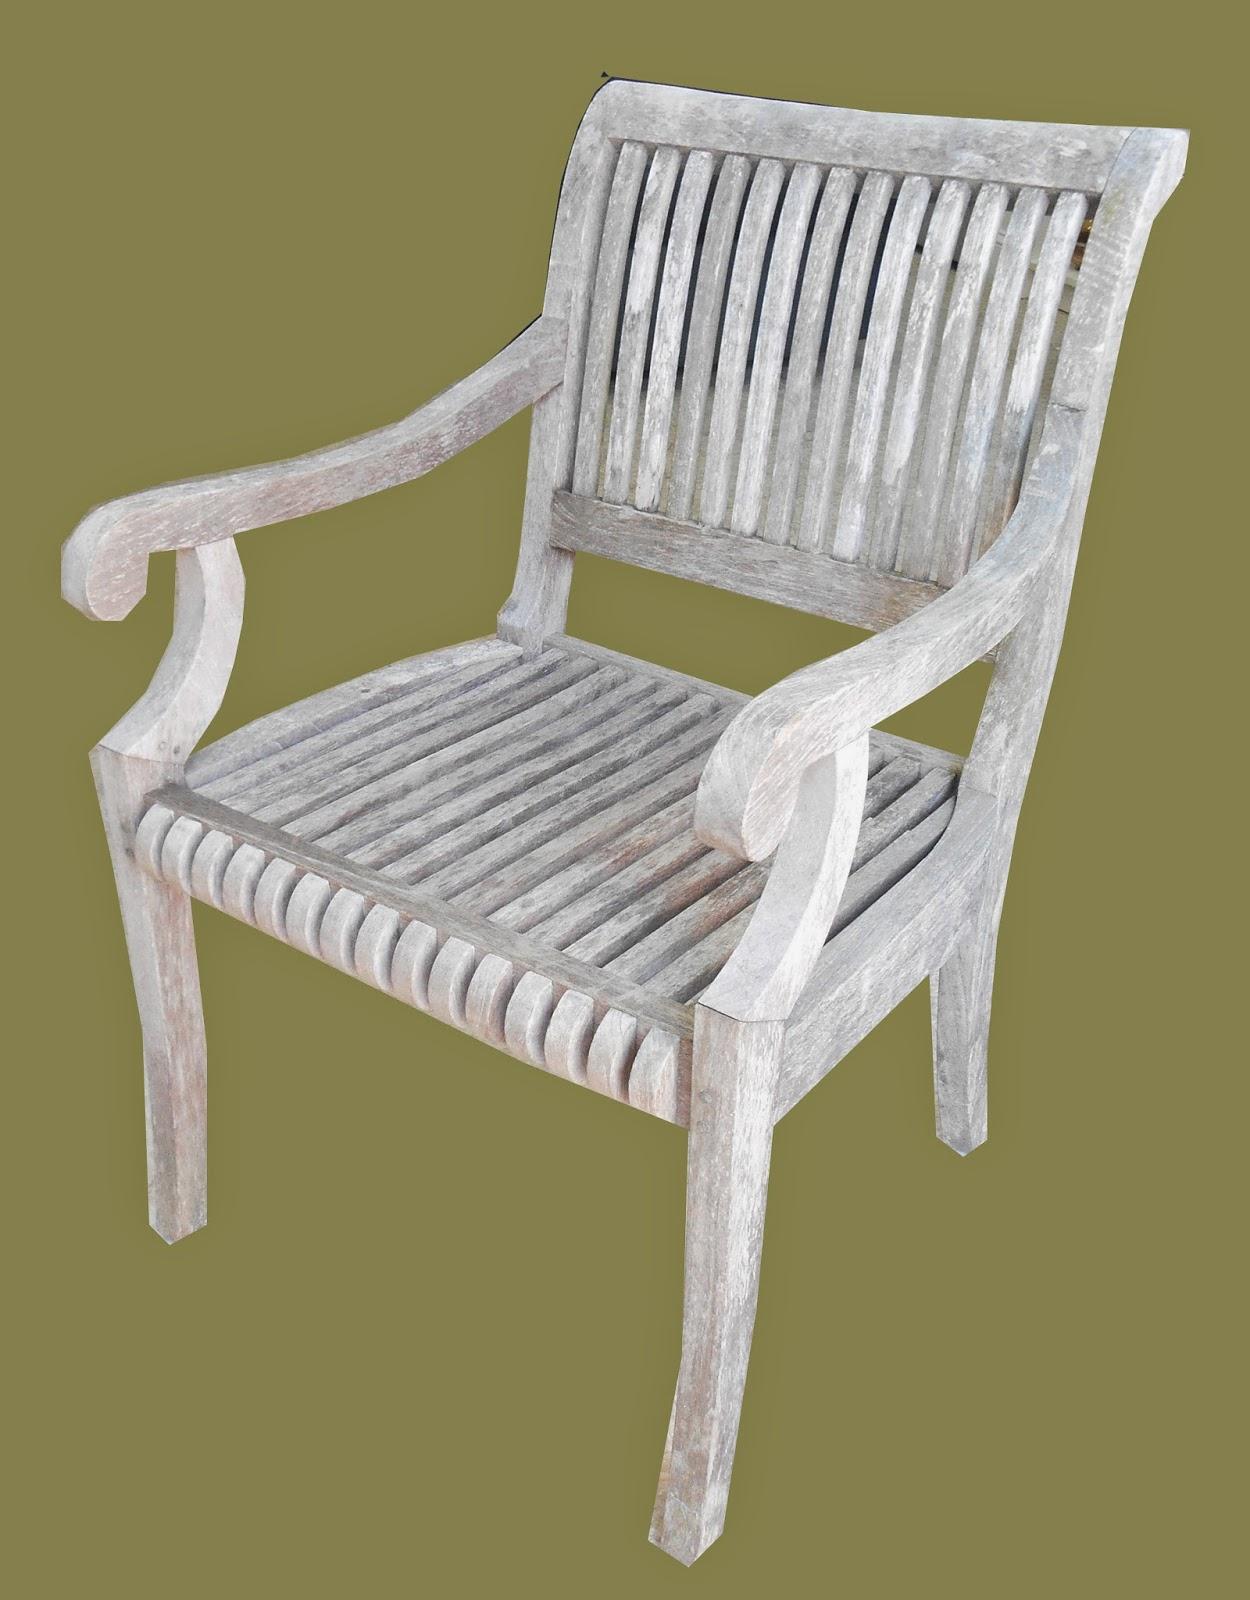 Uhuru Furniture & Collectibles: Weathered Teak Outdoor ...